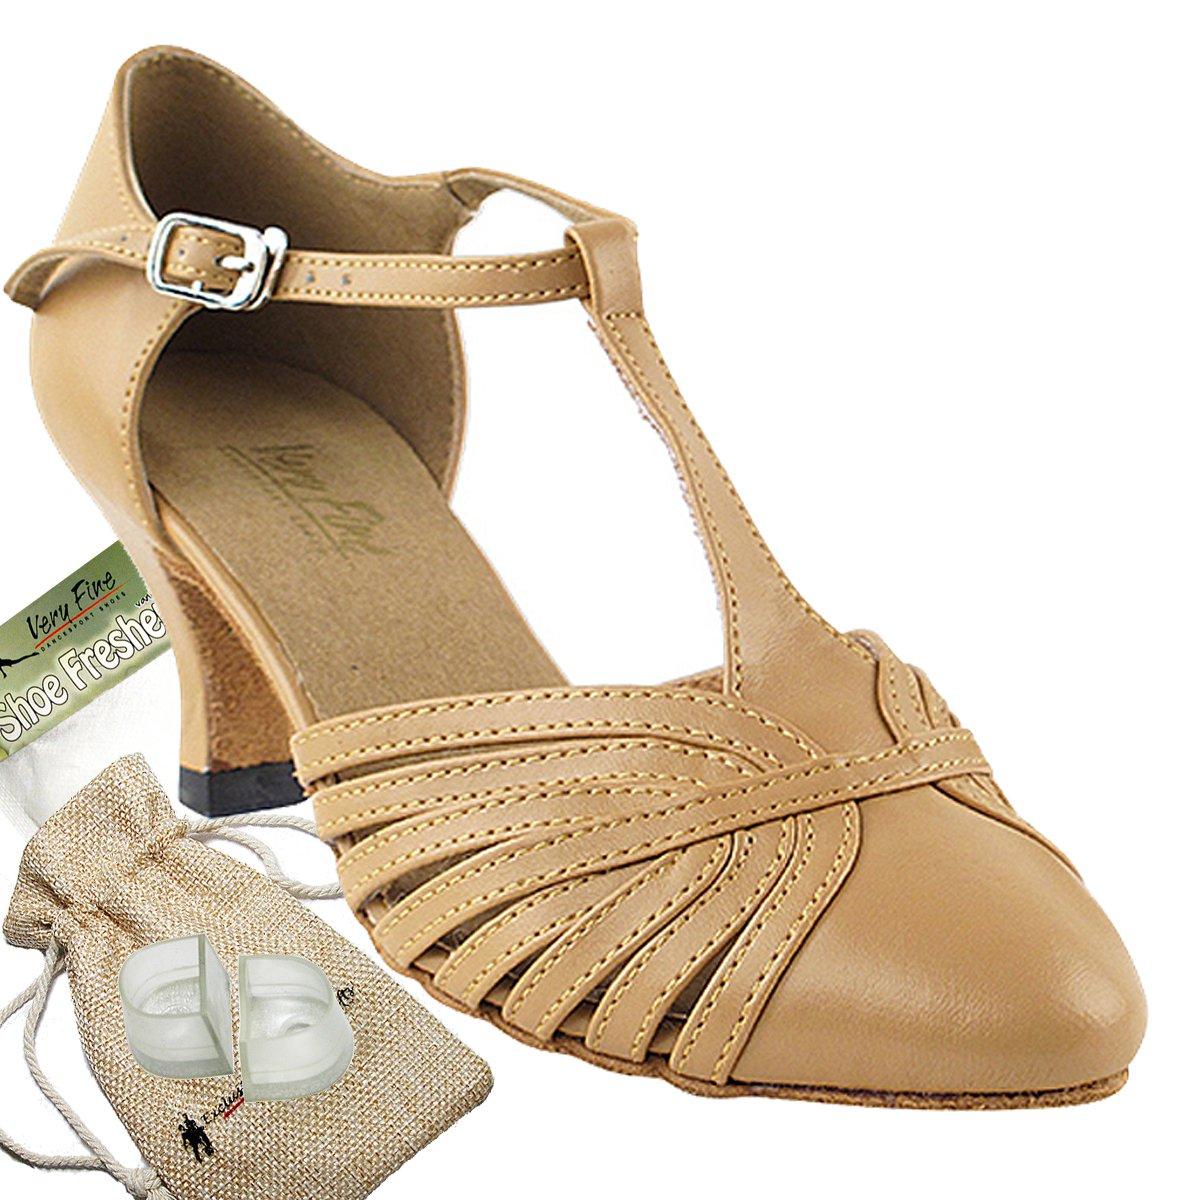 Women's Ballroom Dance Shoes Tango Wedding Salsa Dance Shoes Beige Brown Leather 6829BEB Comfortable - Very Fine 2.5'' Heel 5 M US [Bundle of 5]